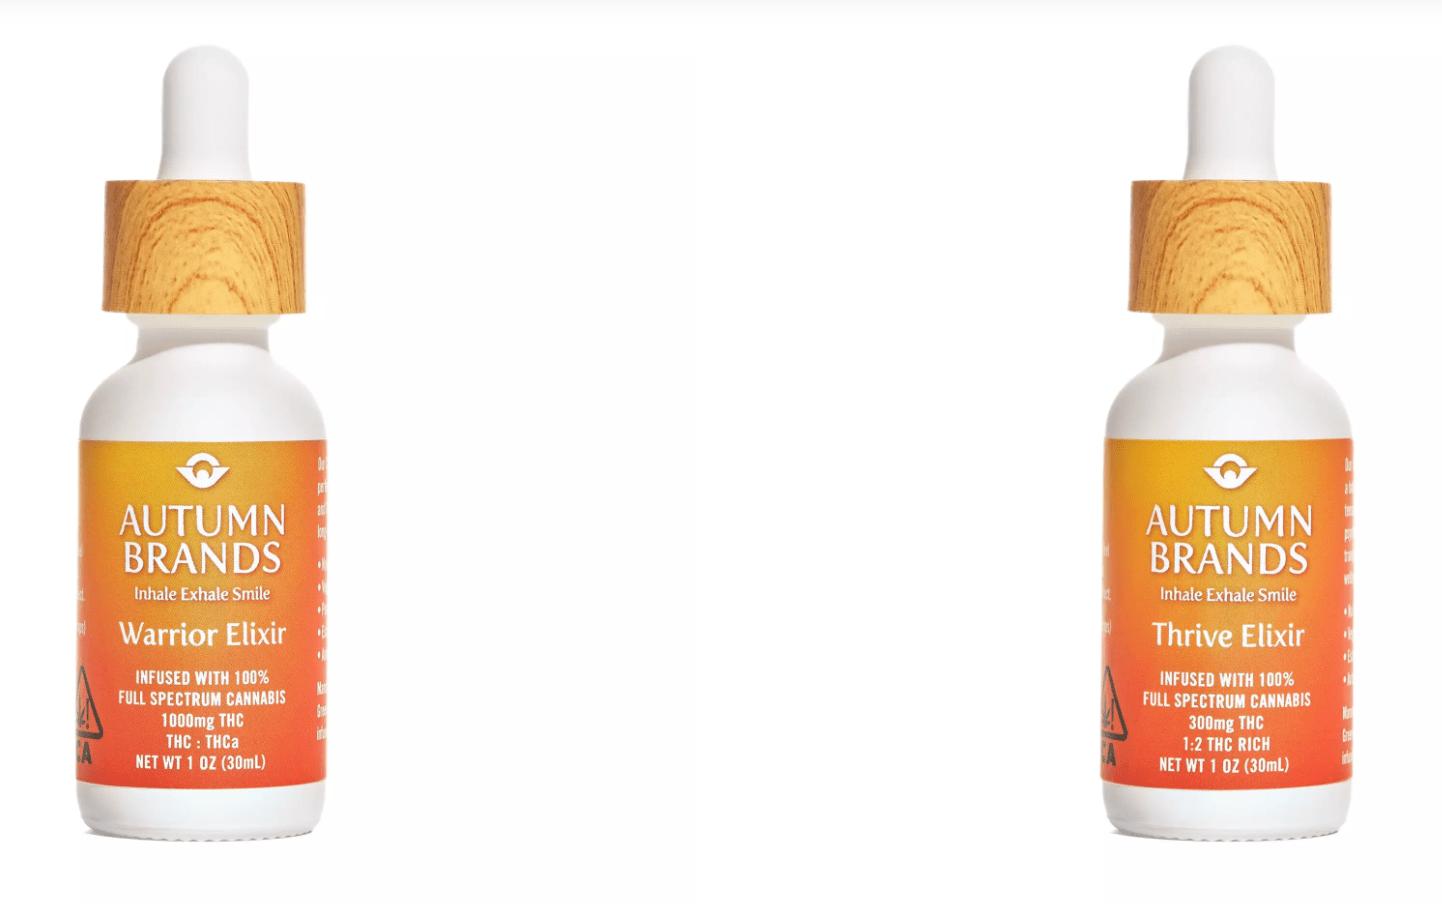 Autumn Brands Thrive Elixir Warrior Elixir